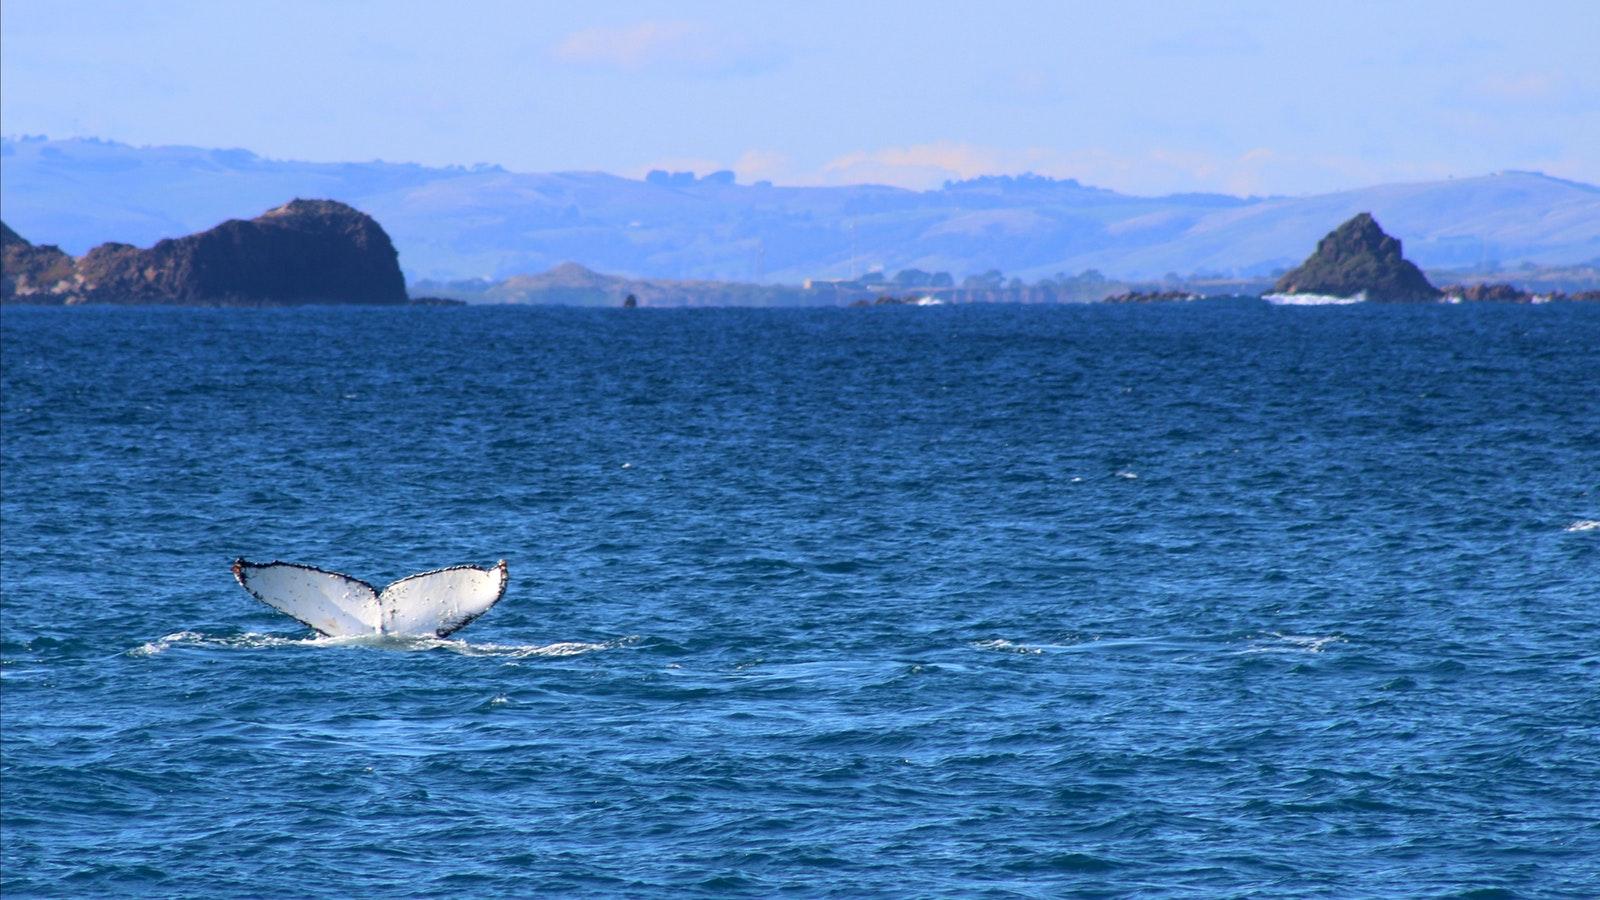 phillip island, whale, renee de bondt, unearthed designs, wildlife coast cruises